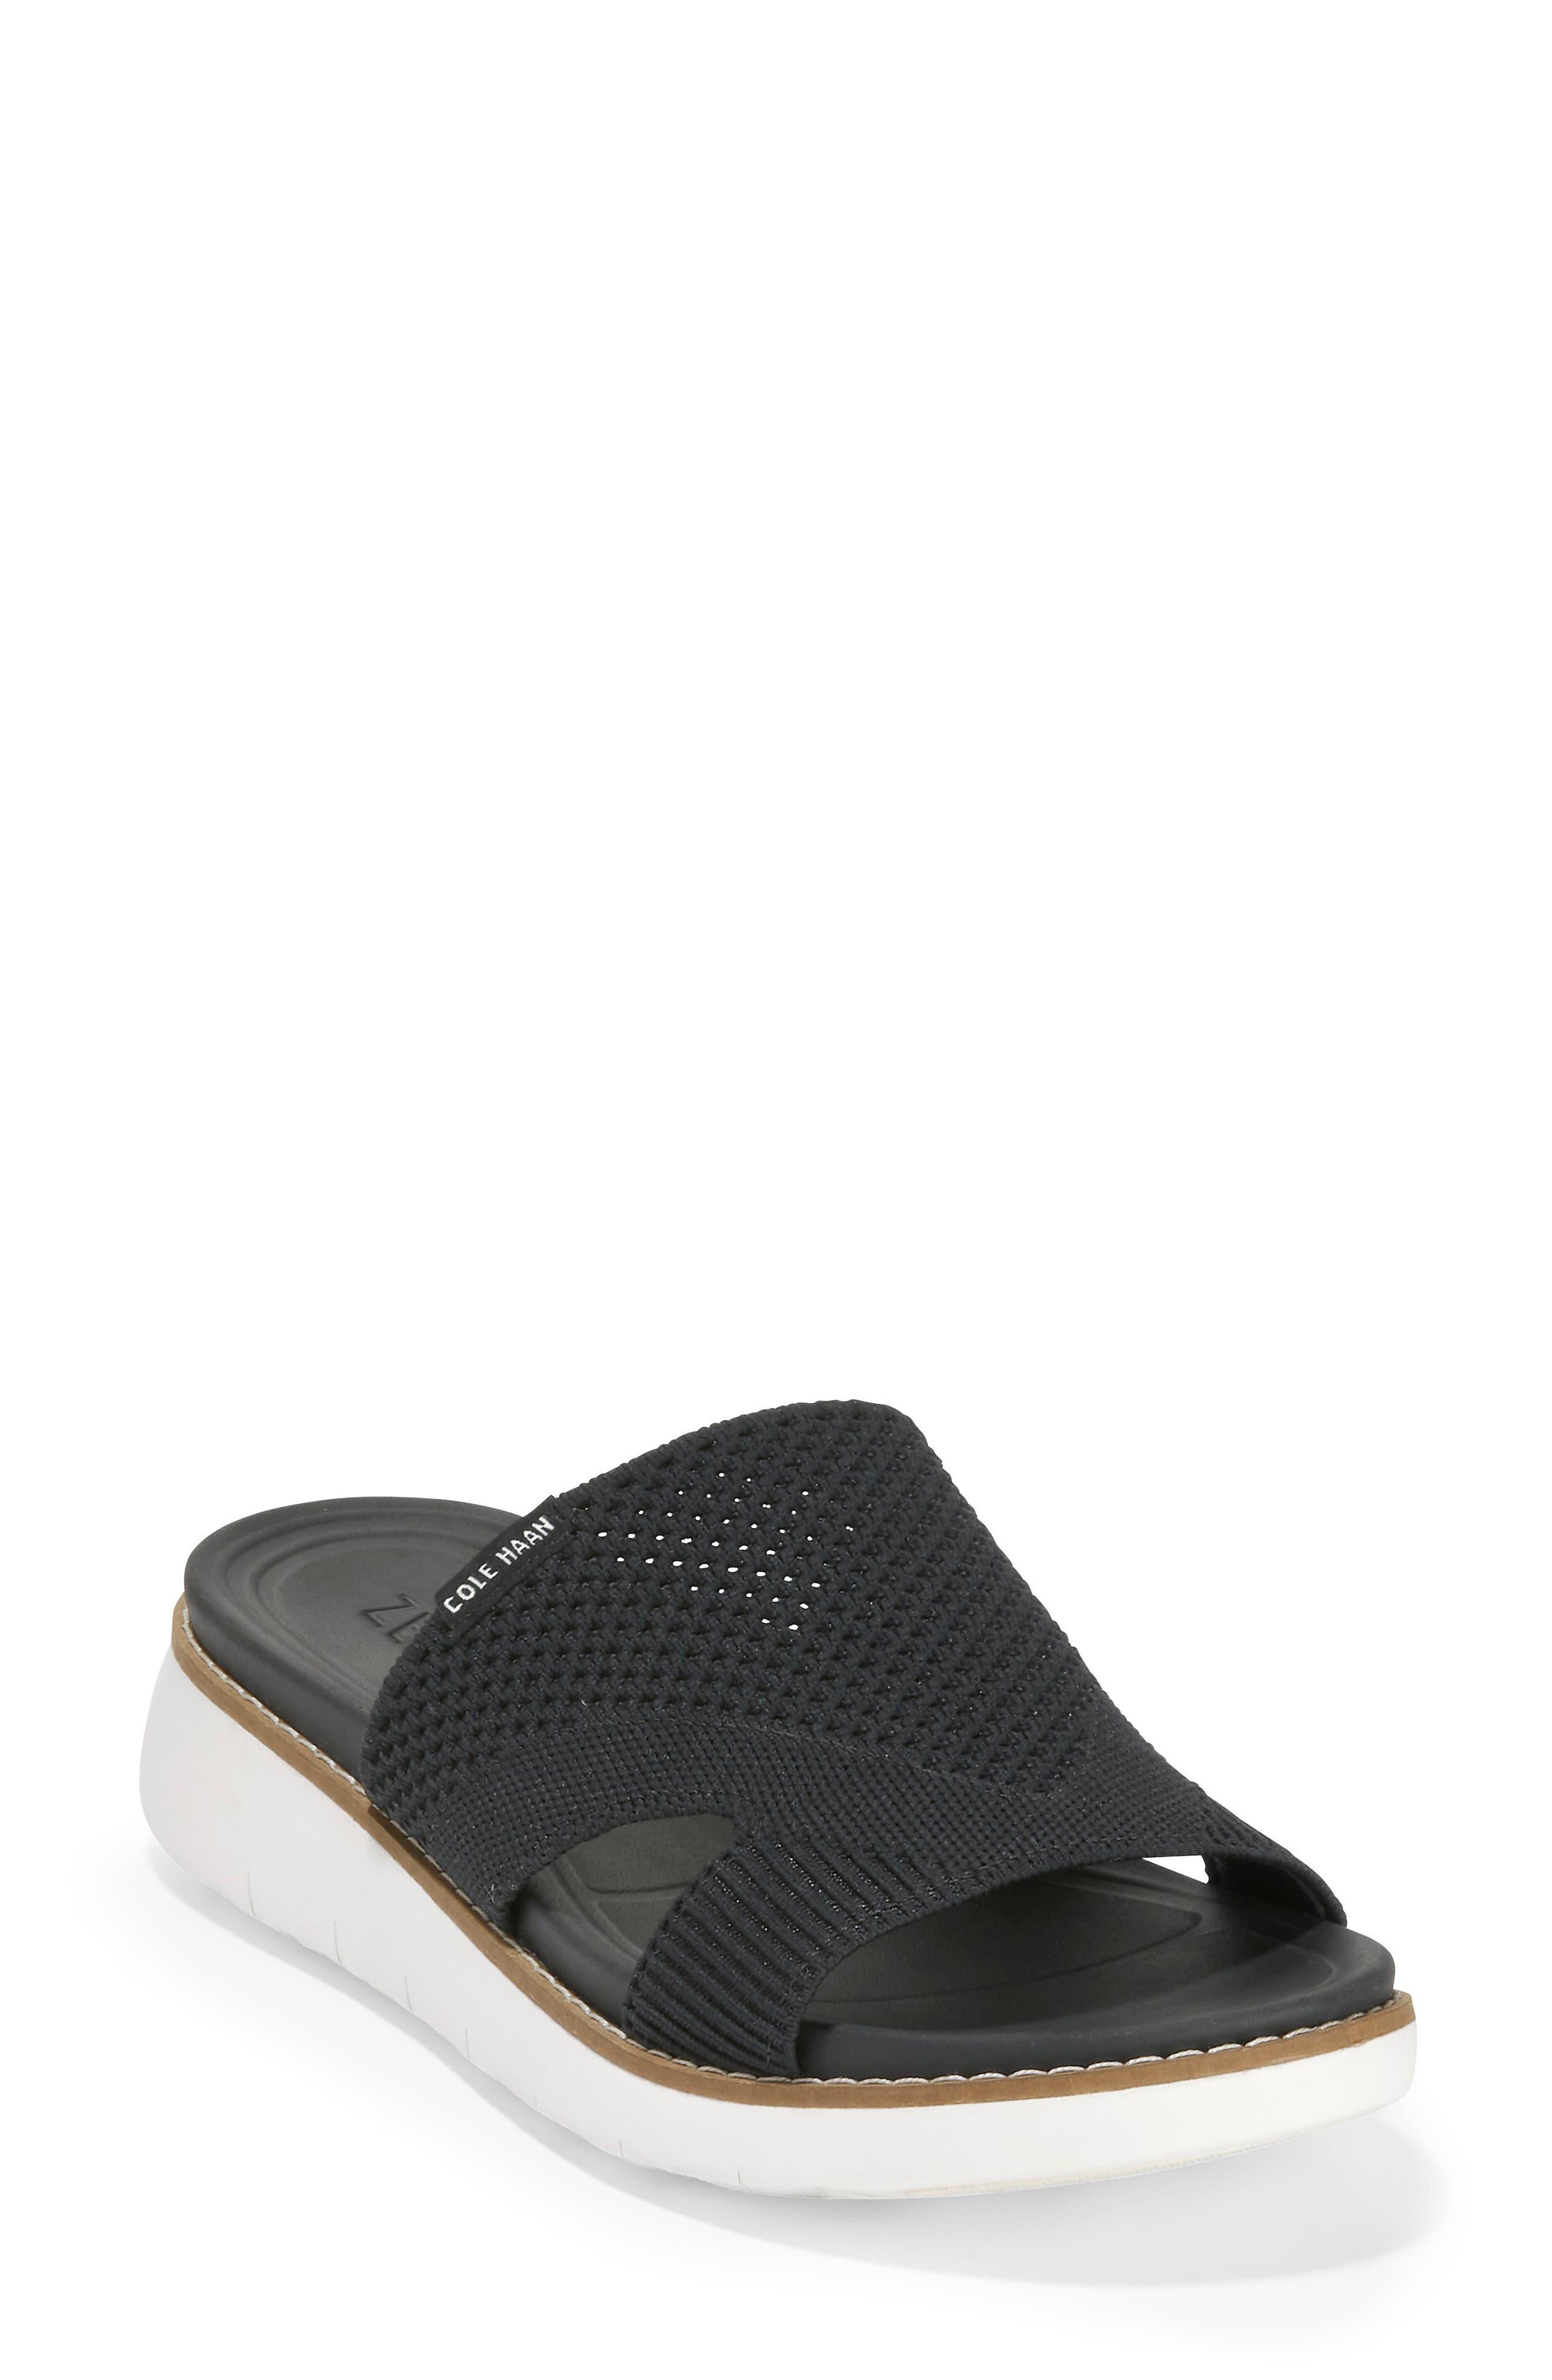 Zerogrand Global Stitchlite(TM) Slide Sandal